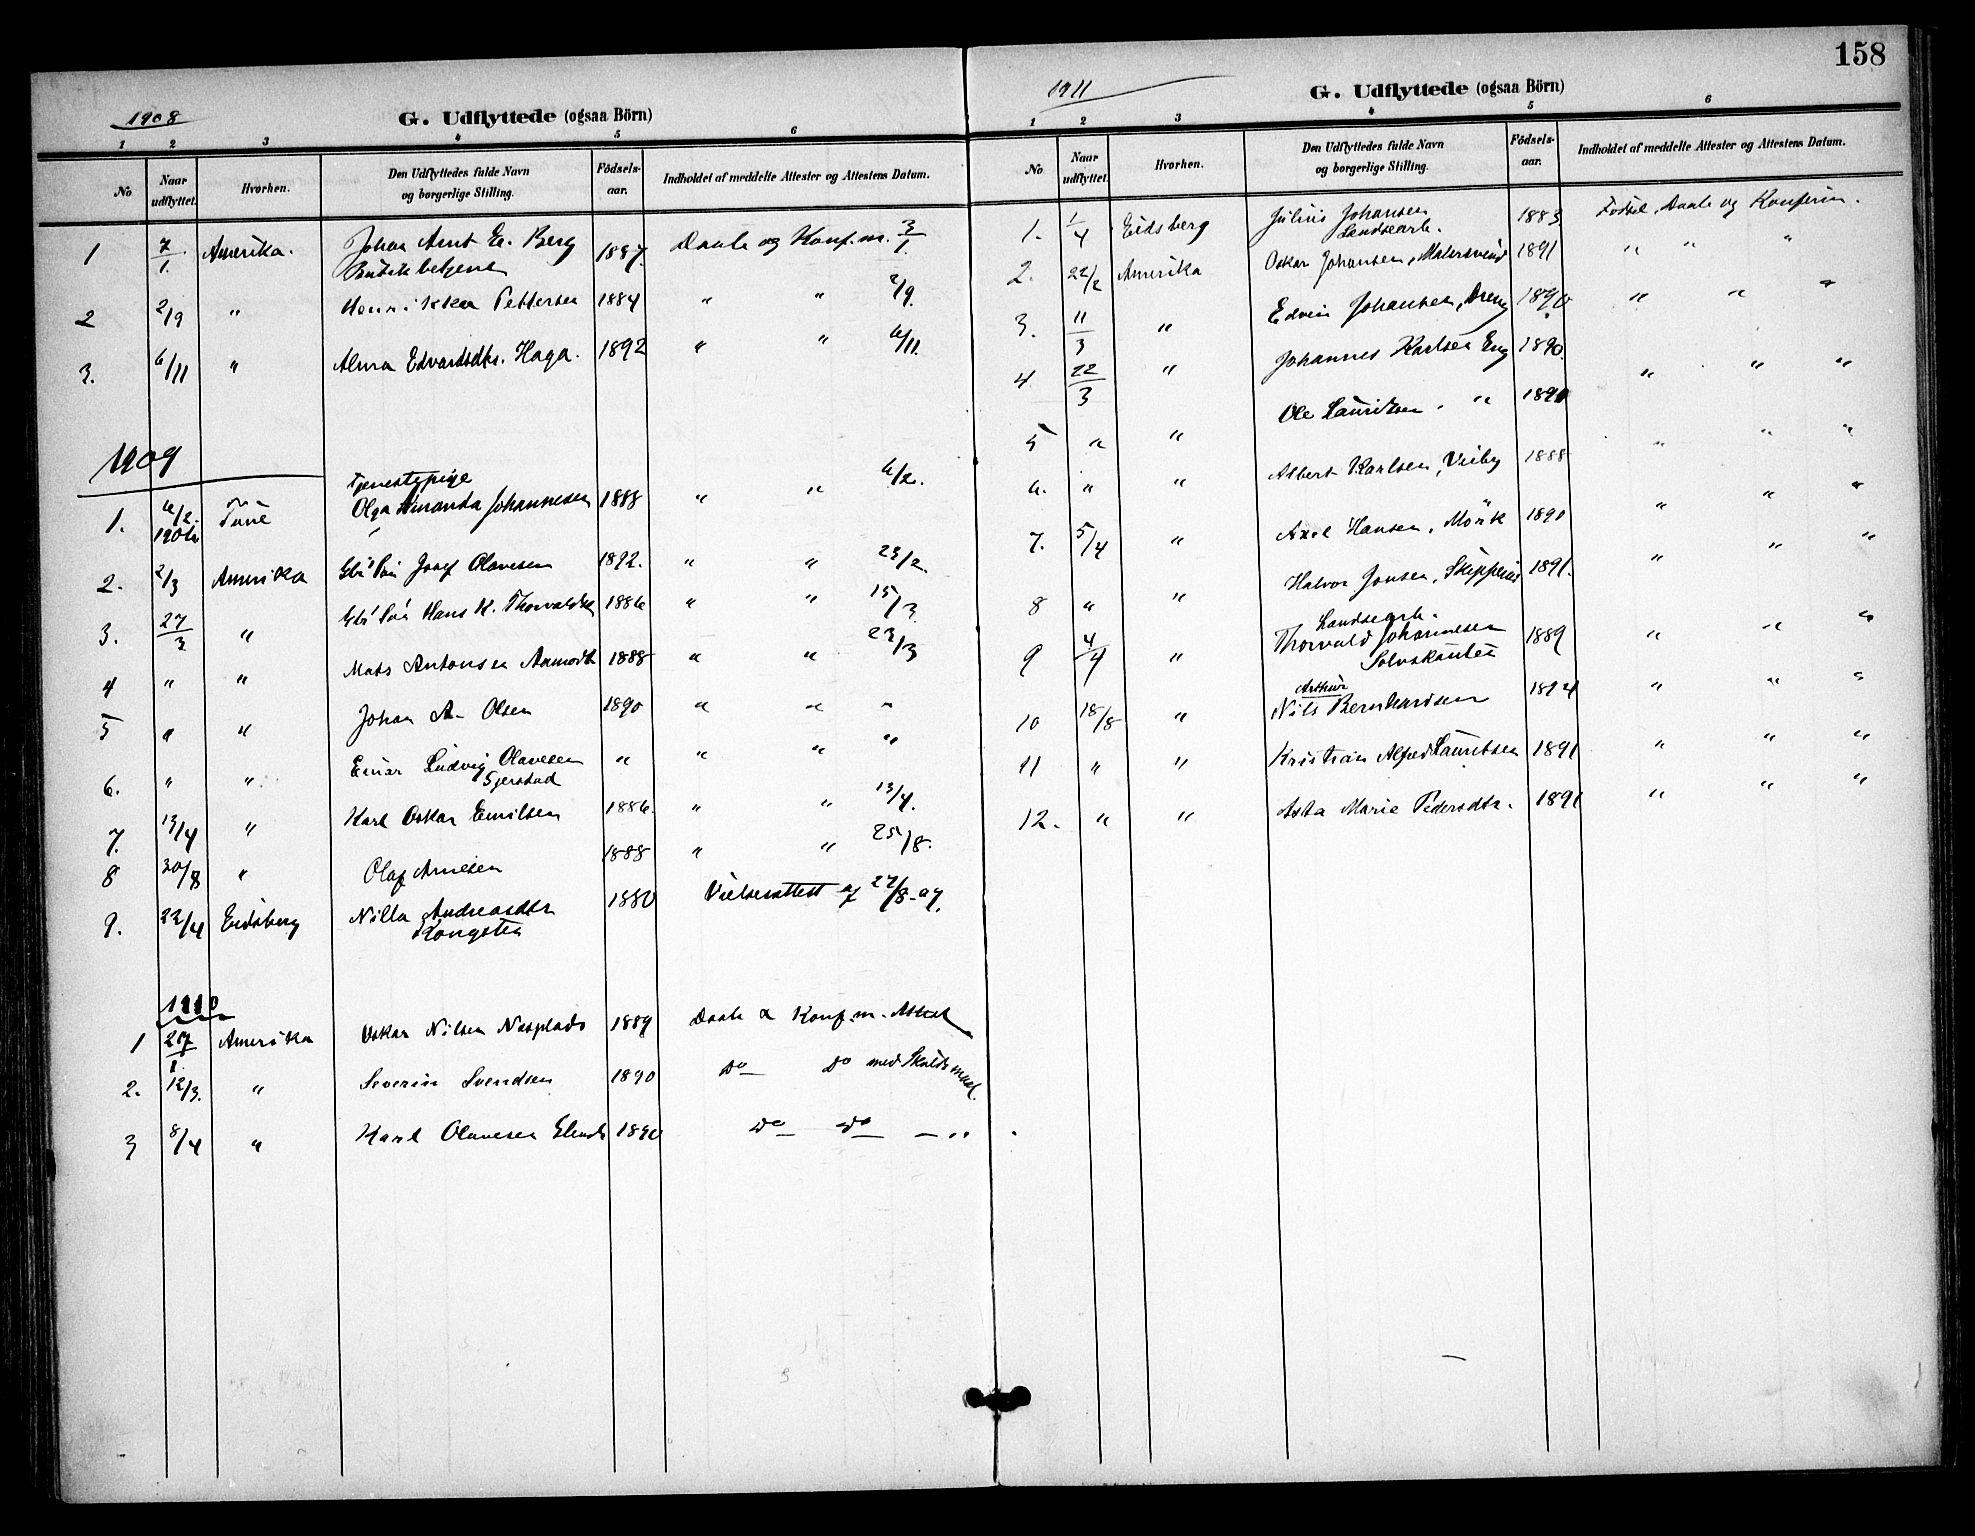 SAO, Skiptvet prestekontor Kirkebøker, F/Fa/L0011: Ministerialbok nr. 11, 1901-1913, s. 158